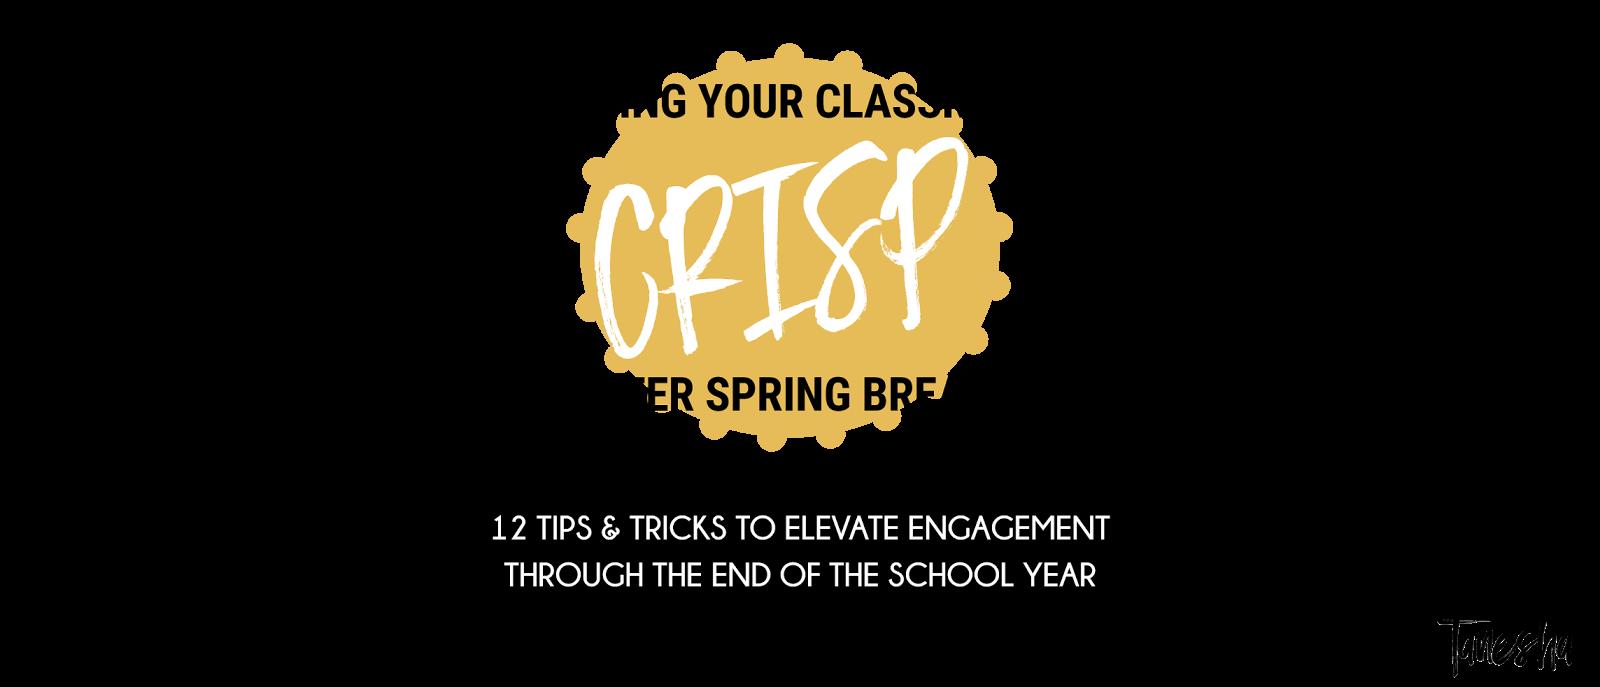 Keeping Your Classroom Crisp After Spring Break